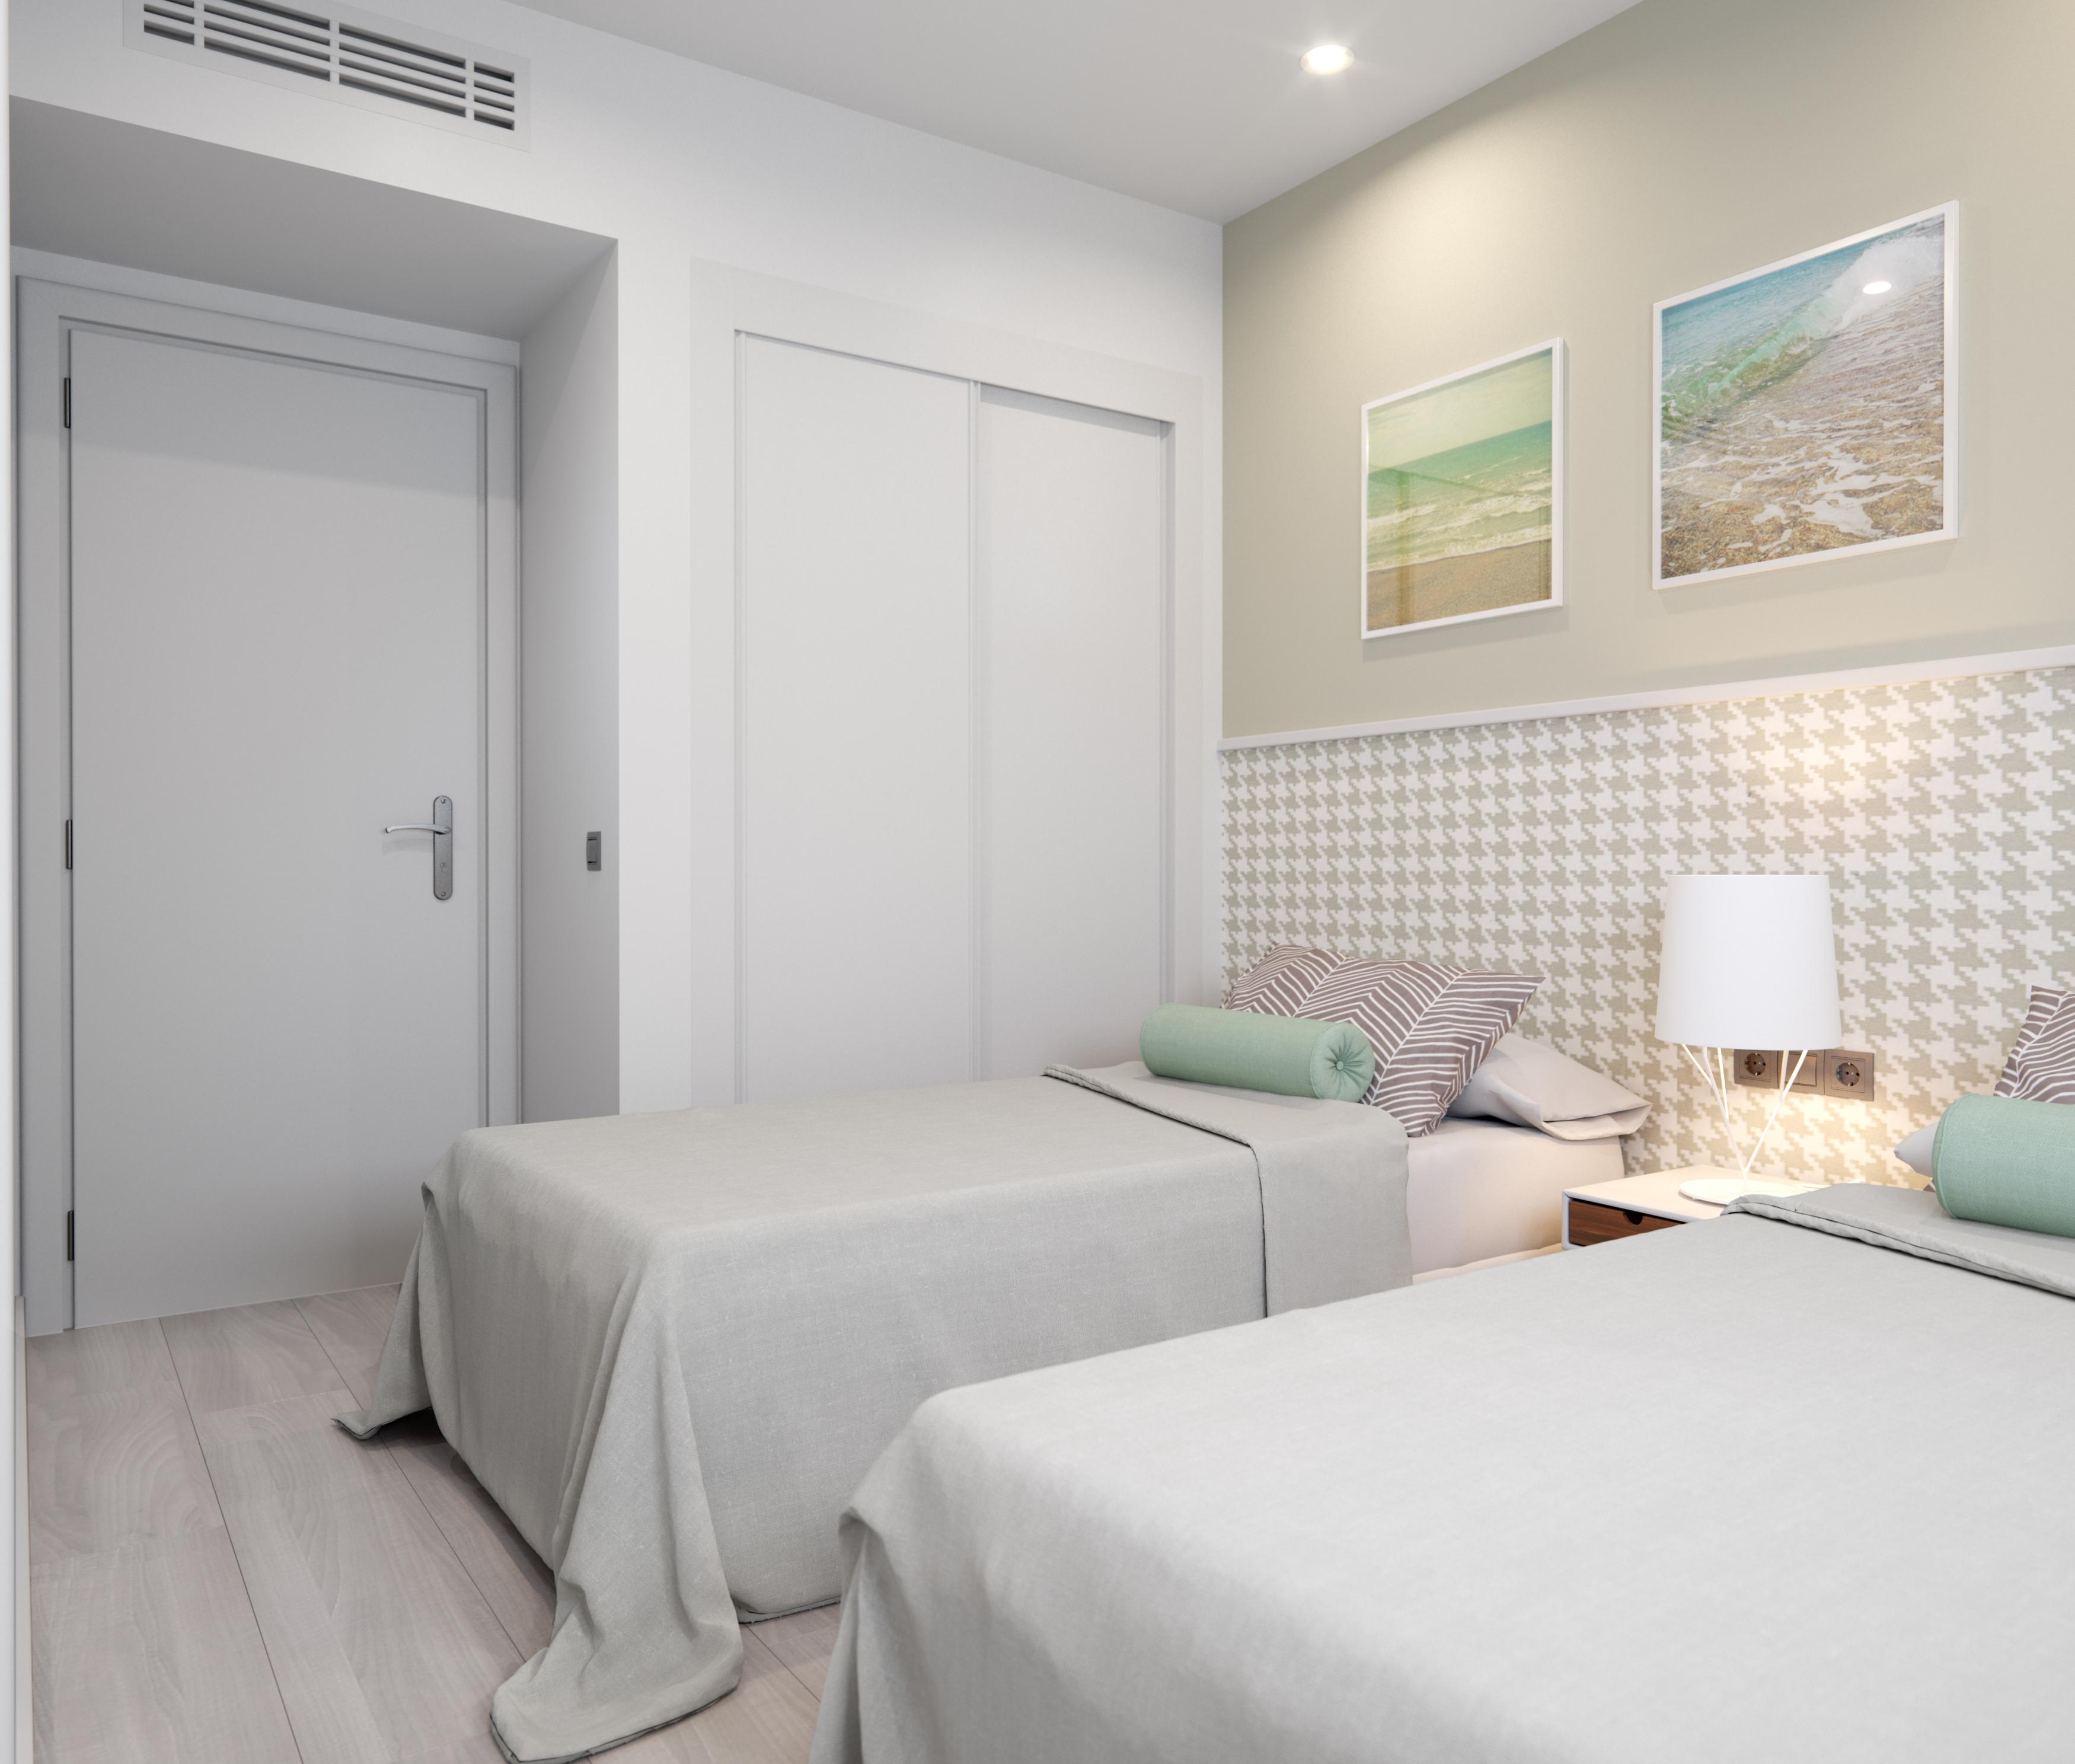 2 bedroom apartment For Sale in Roldan - photograph 16